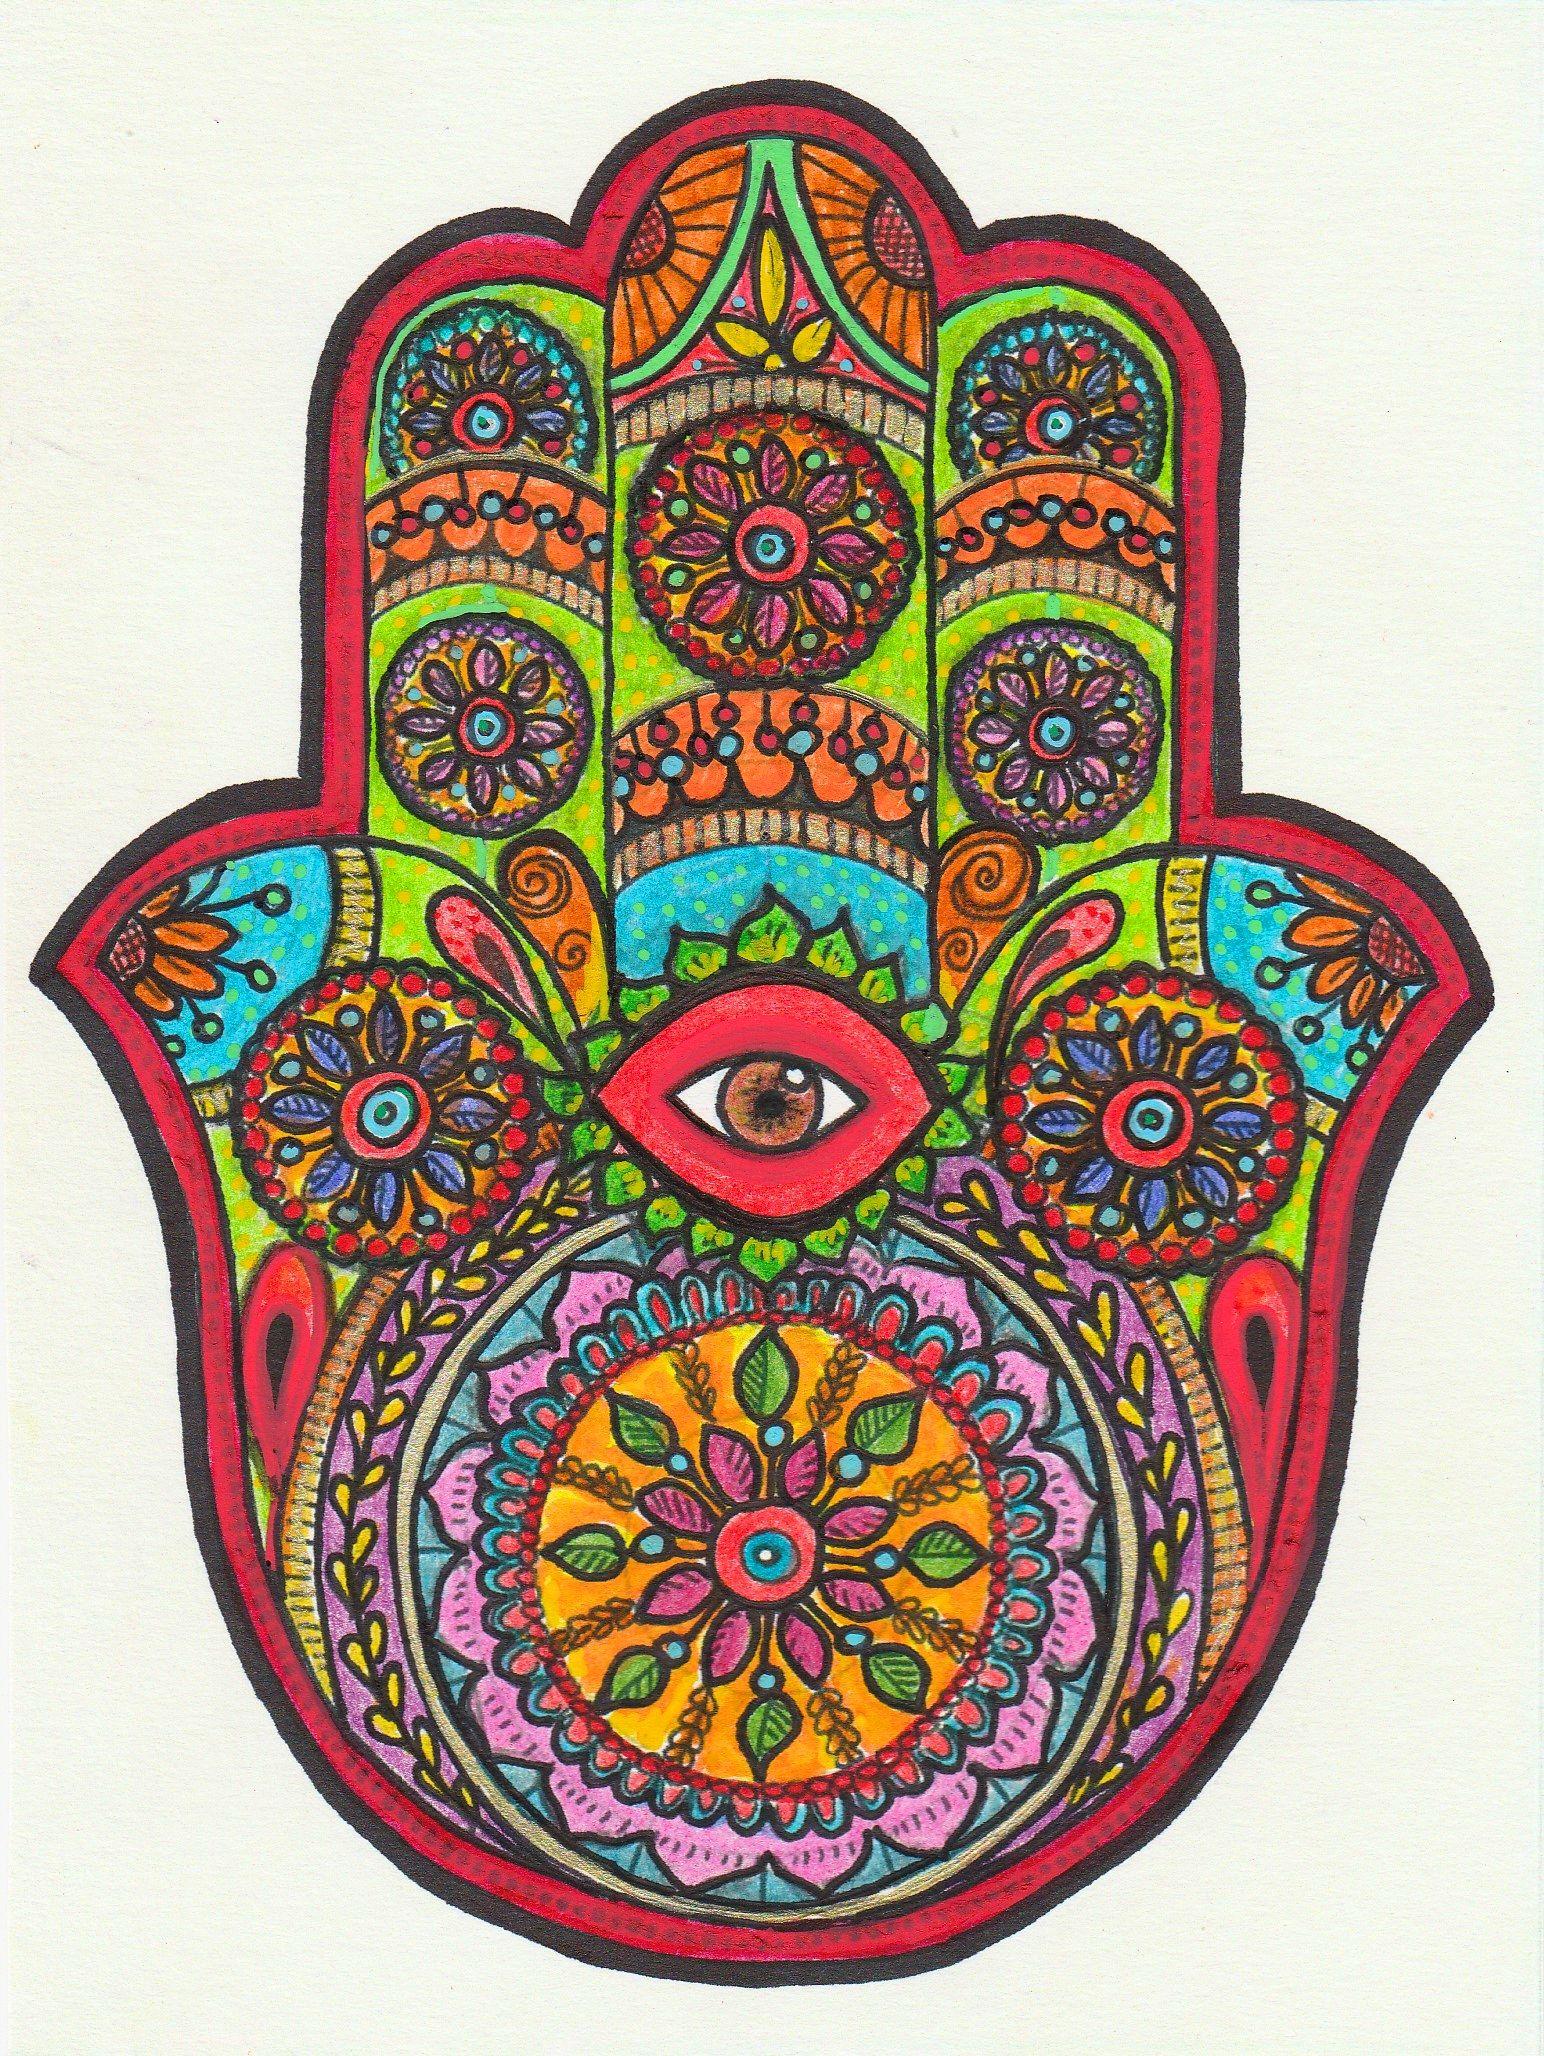 La Main De Fatma : fatma, Coloriages, Dessins, Colourings, Crayons, Couleurs/feutres/posca)